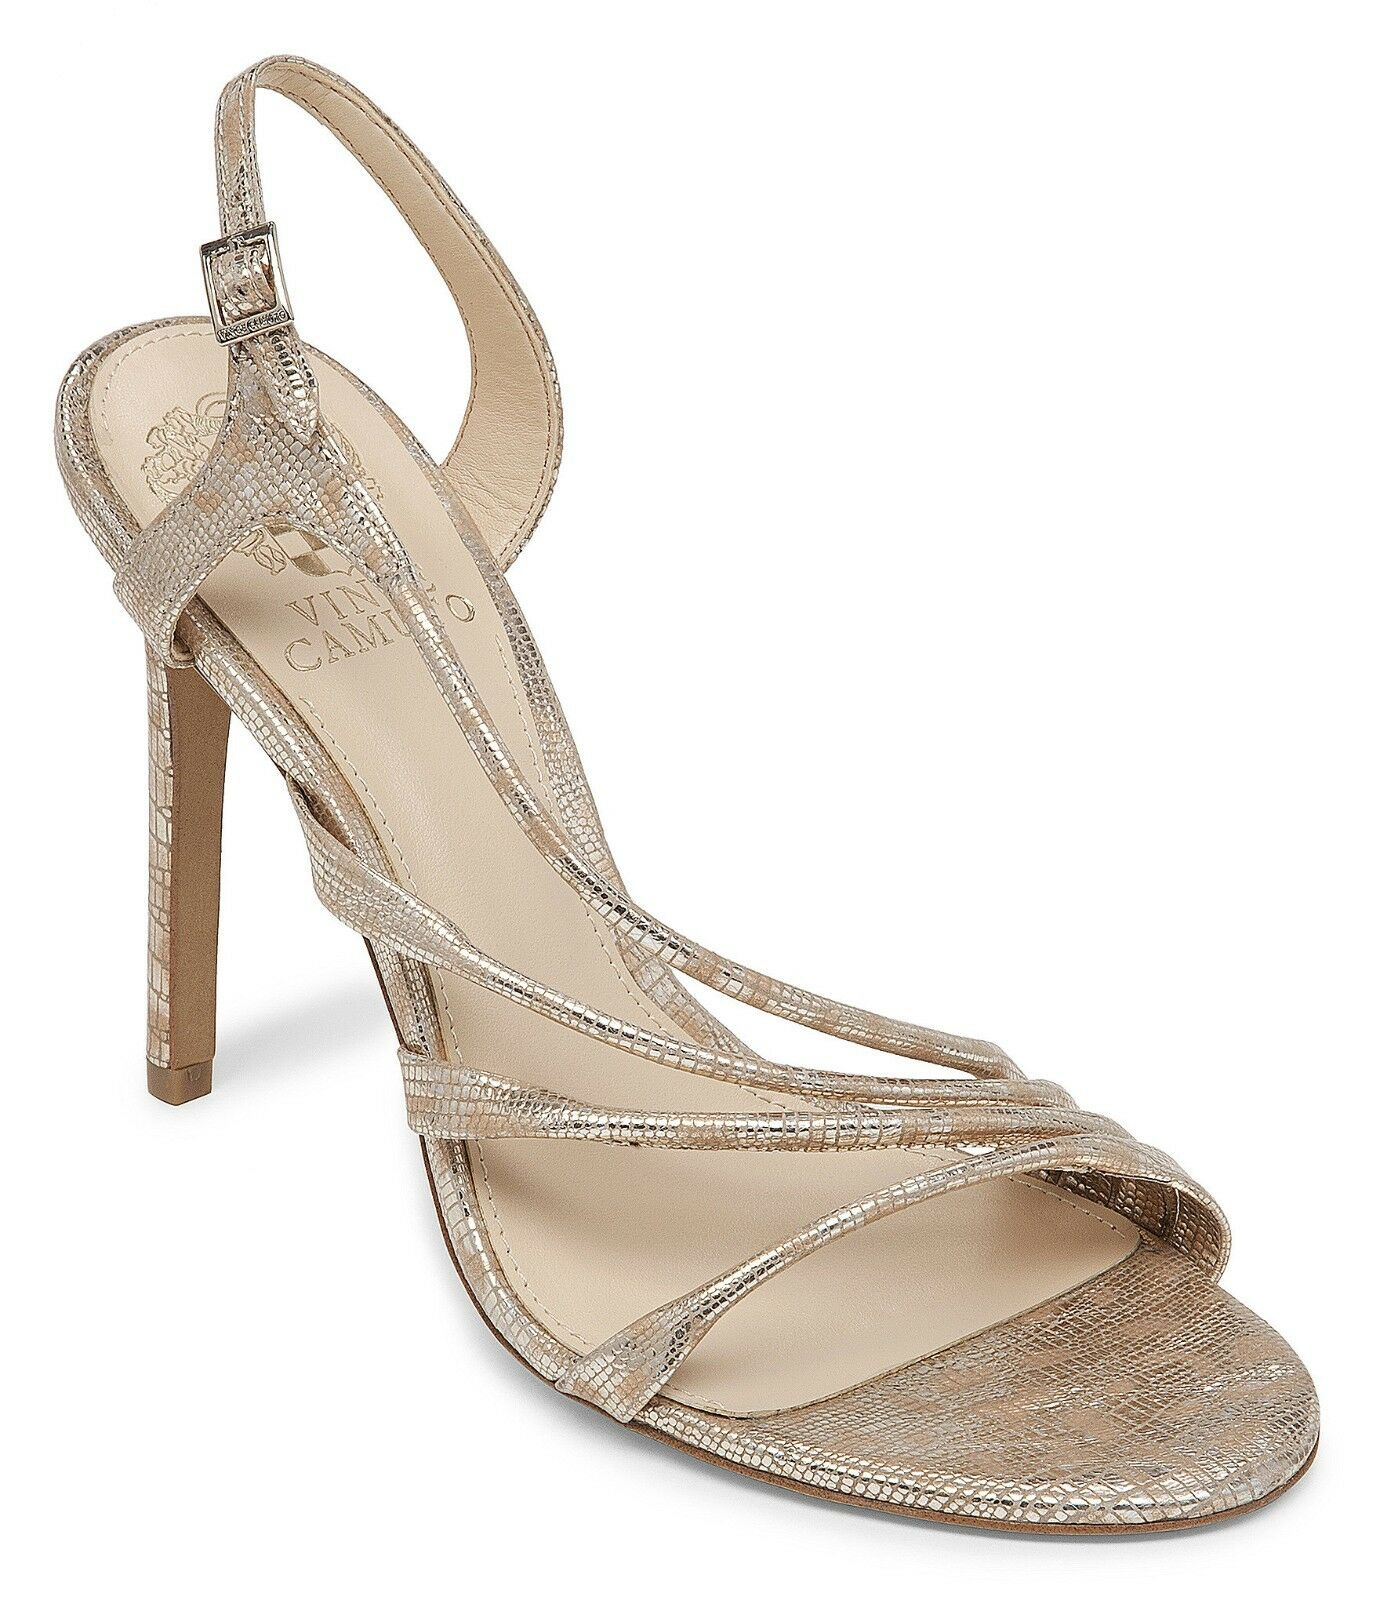 Vince Camuto Tiernan Snake Slingback Dress Sandals, Dimensiones 9-10 Natural Metallic